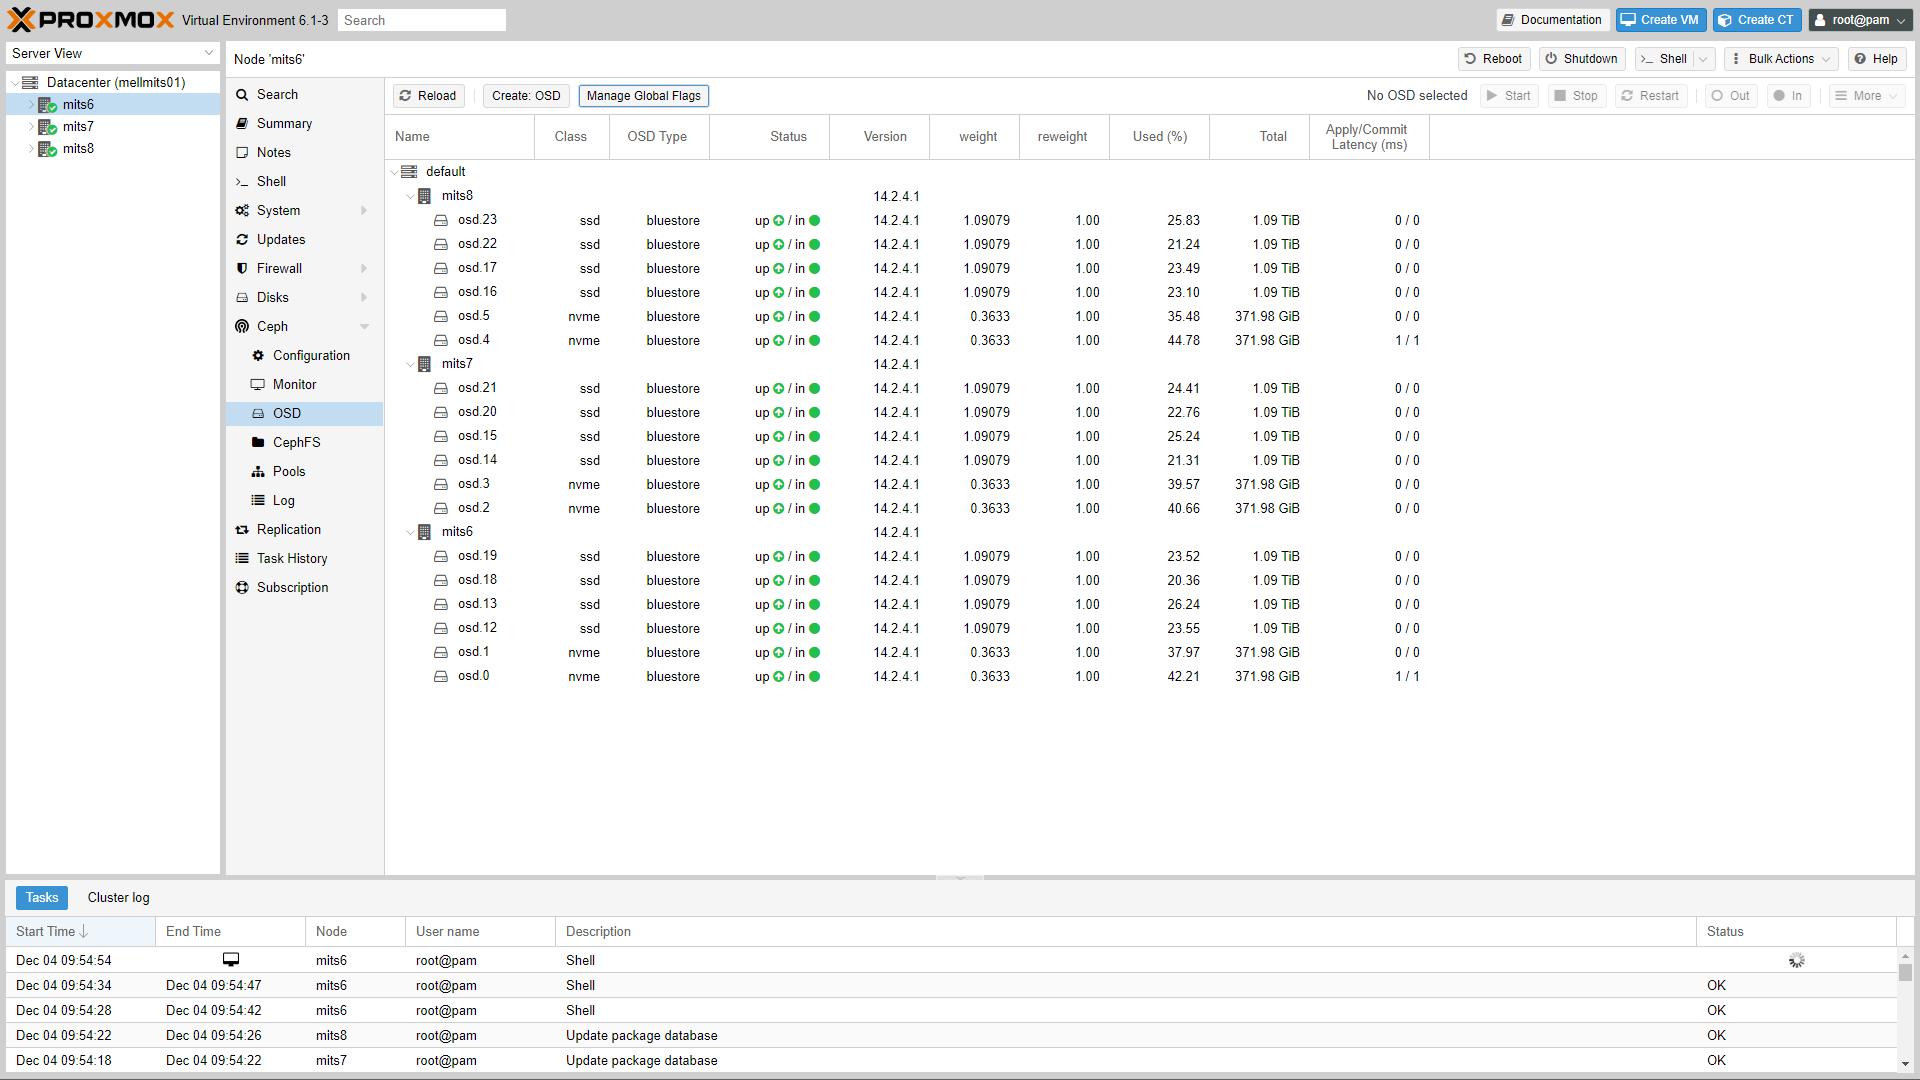 Proxmox VE 6.1 Ceph OSD